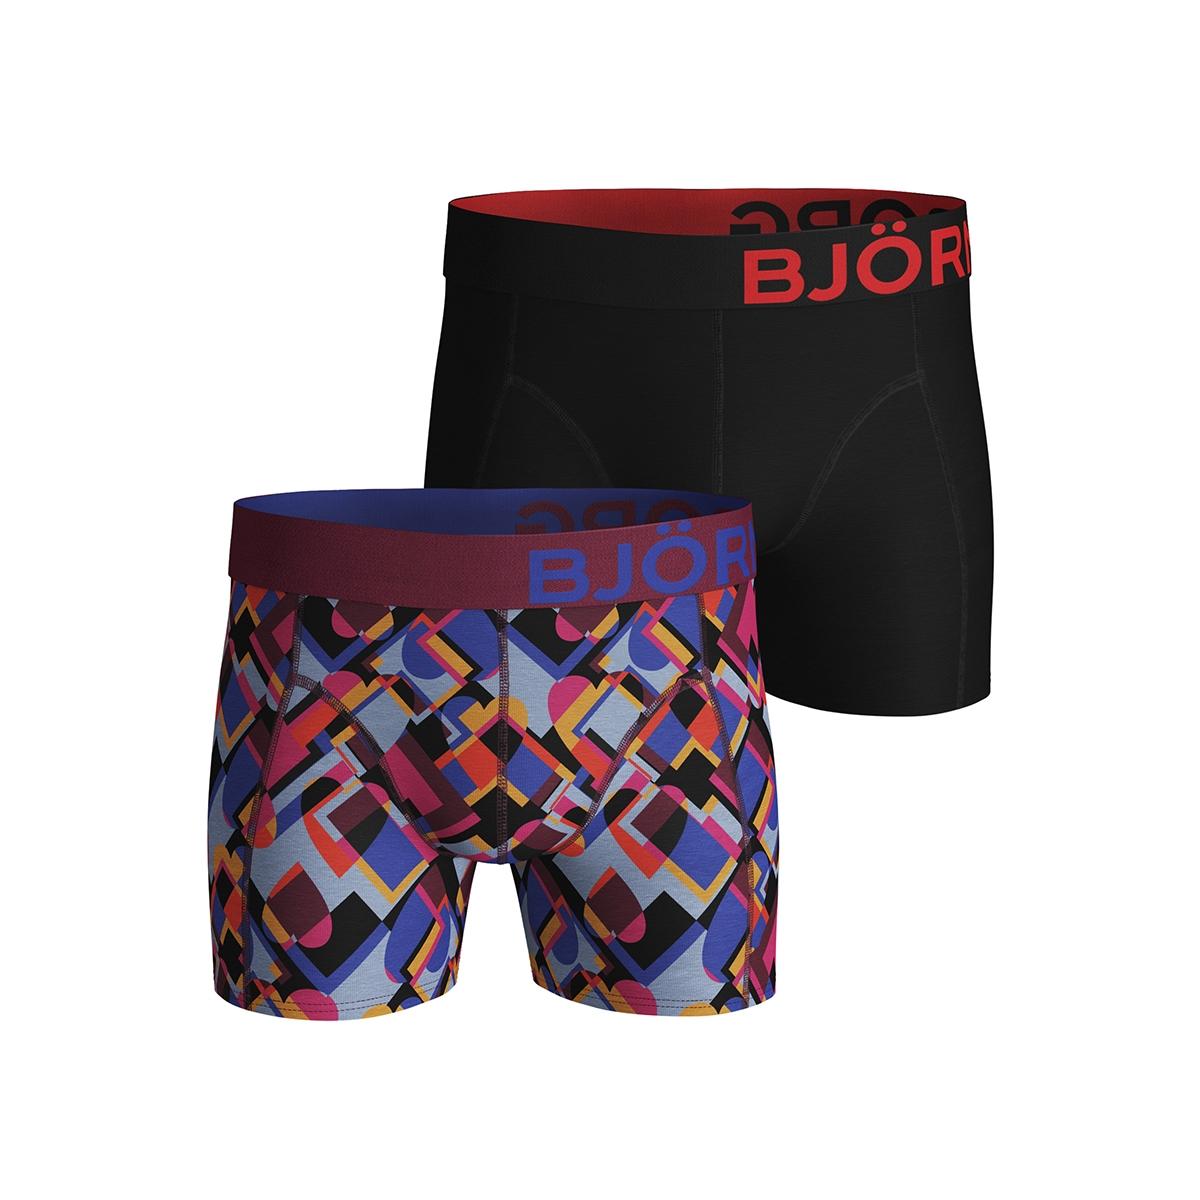 2p shorts bb amour 1841 1159 bjorn borg ondergoed 70261 dazzling blue